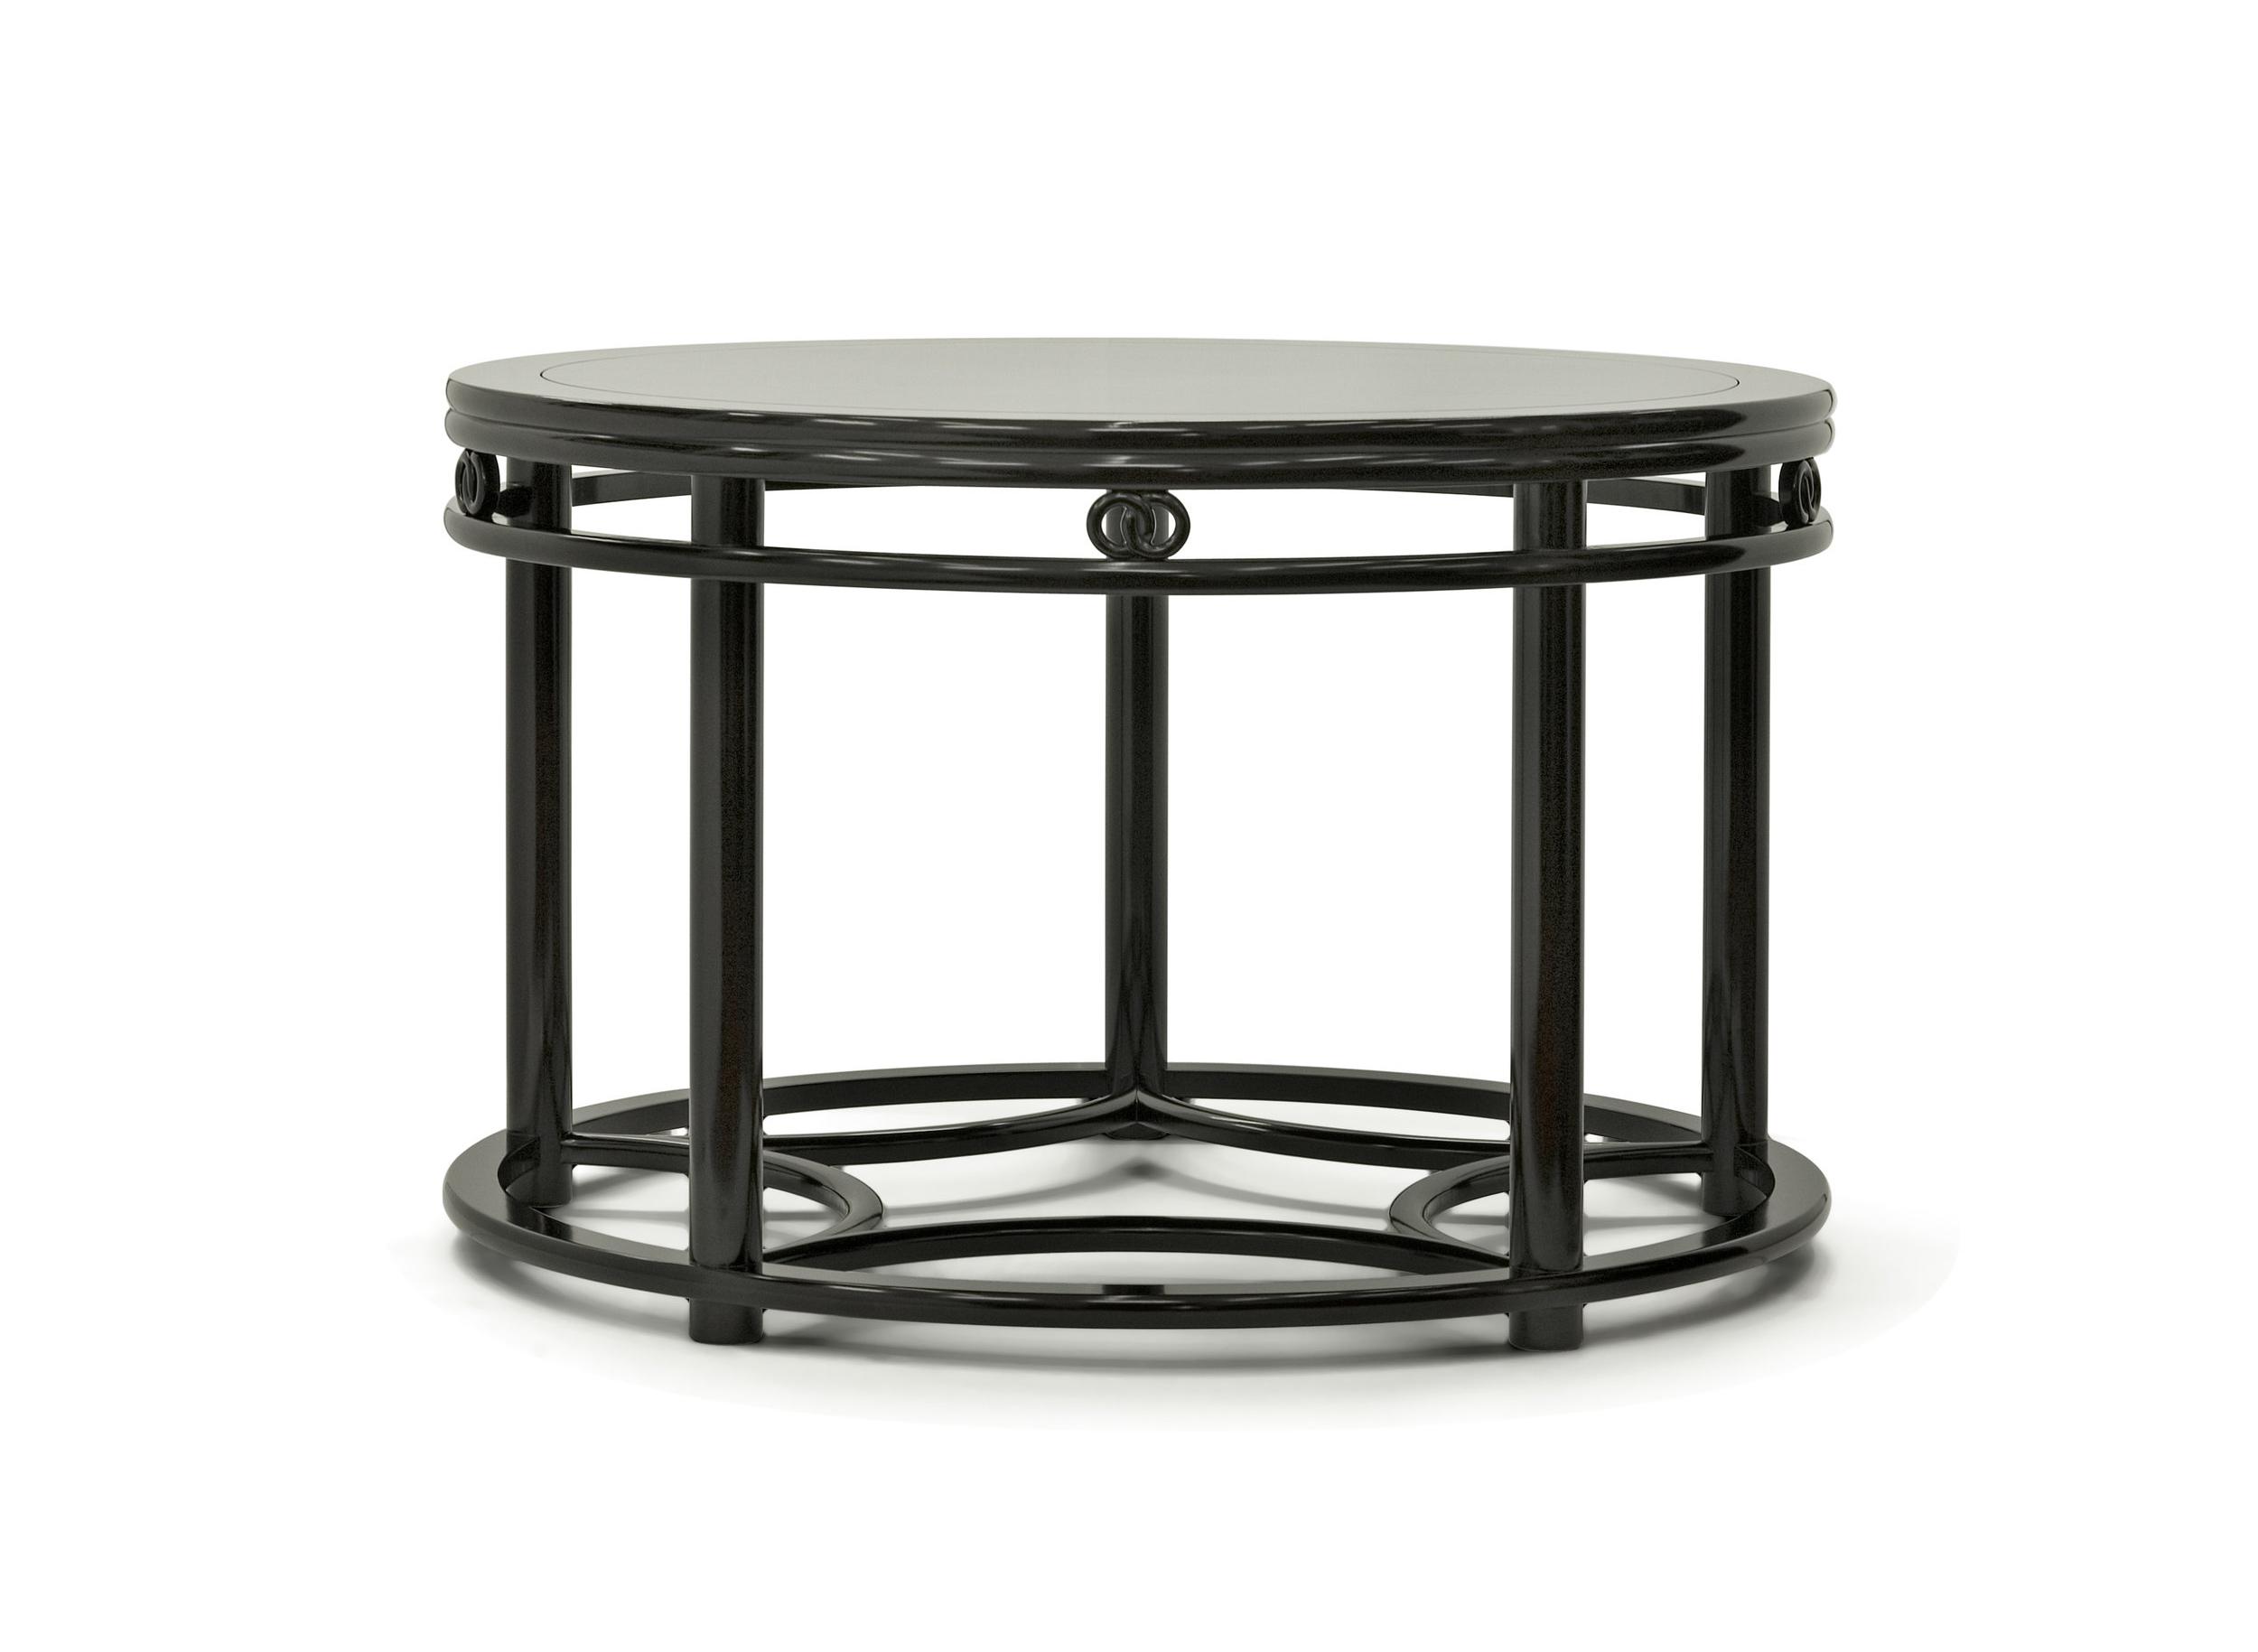 ....Bespoke Qing Style Chinese furniture : Round Table..特别定制清式中式家具: 圆台....